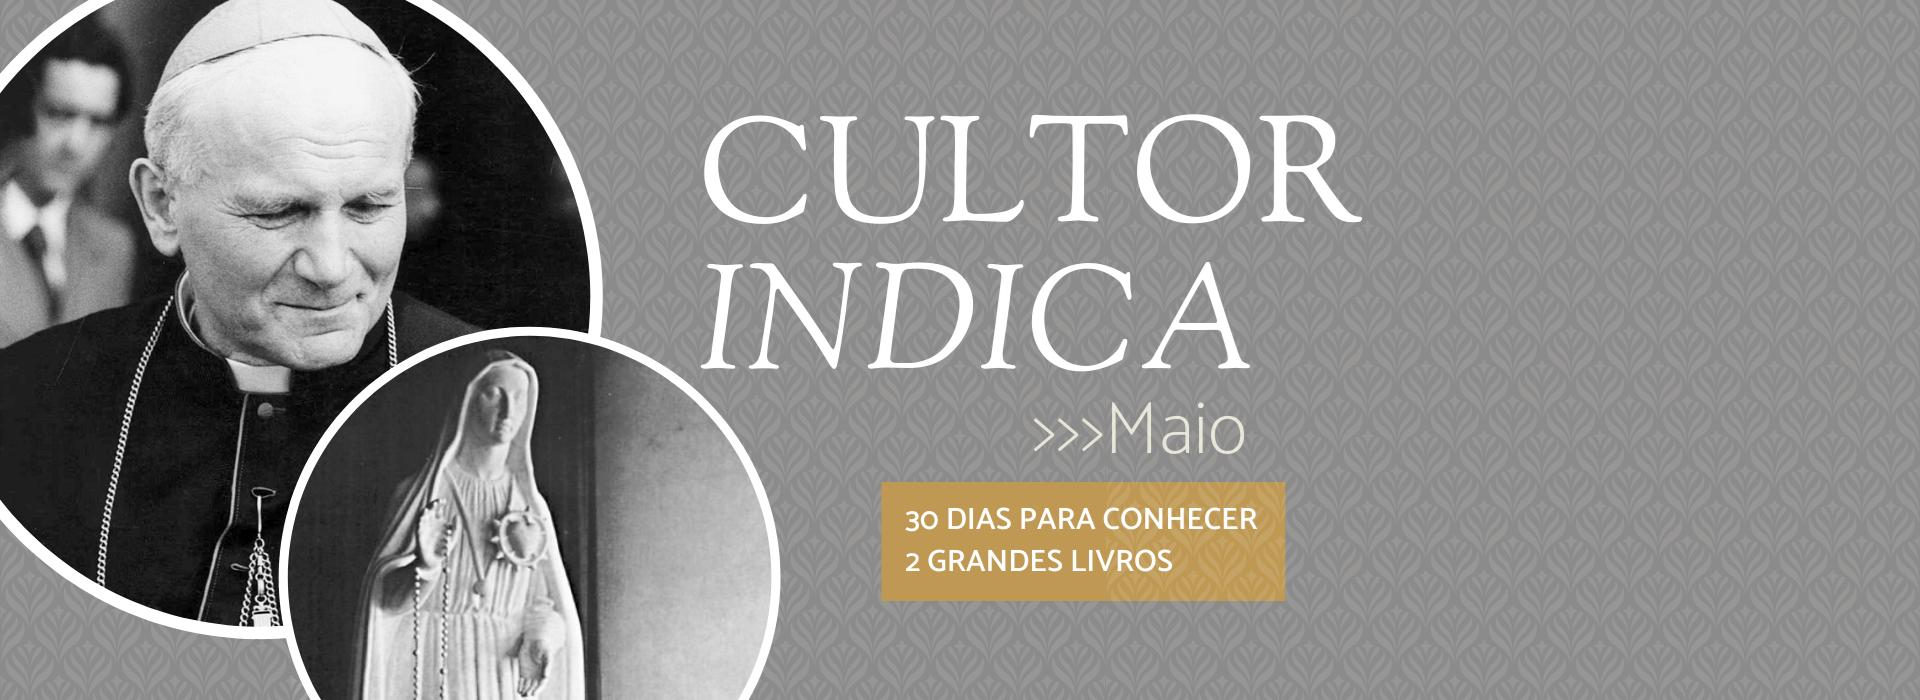 Cultor Indica Maio home Desktop